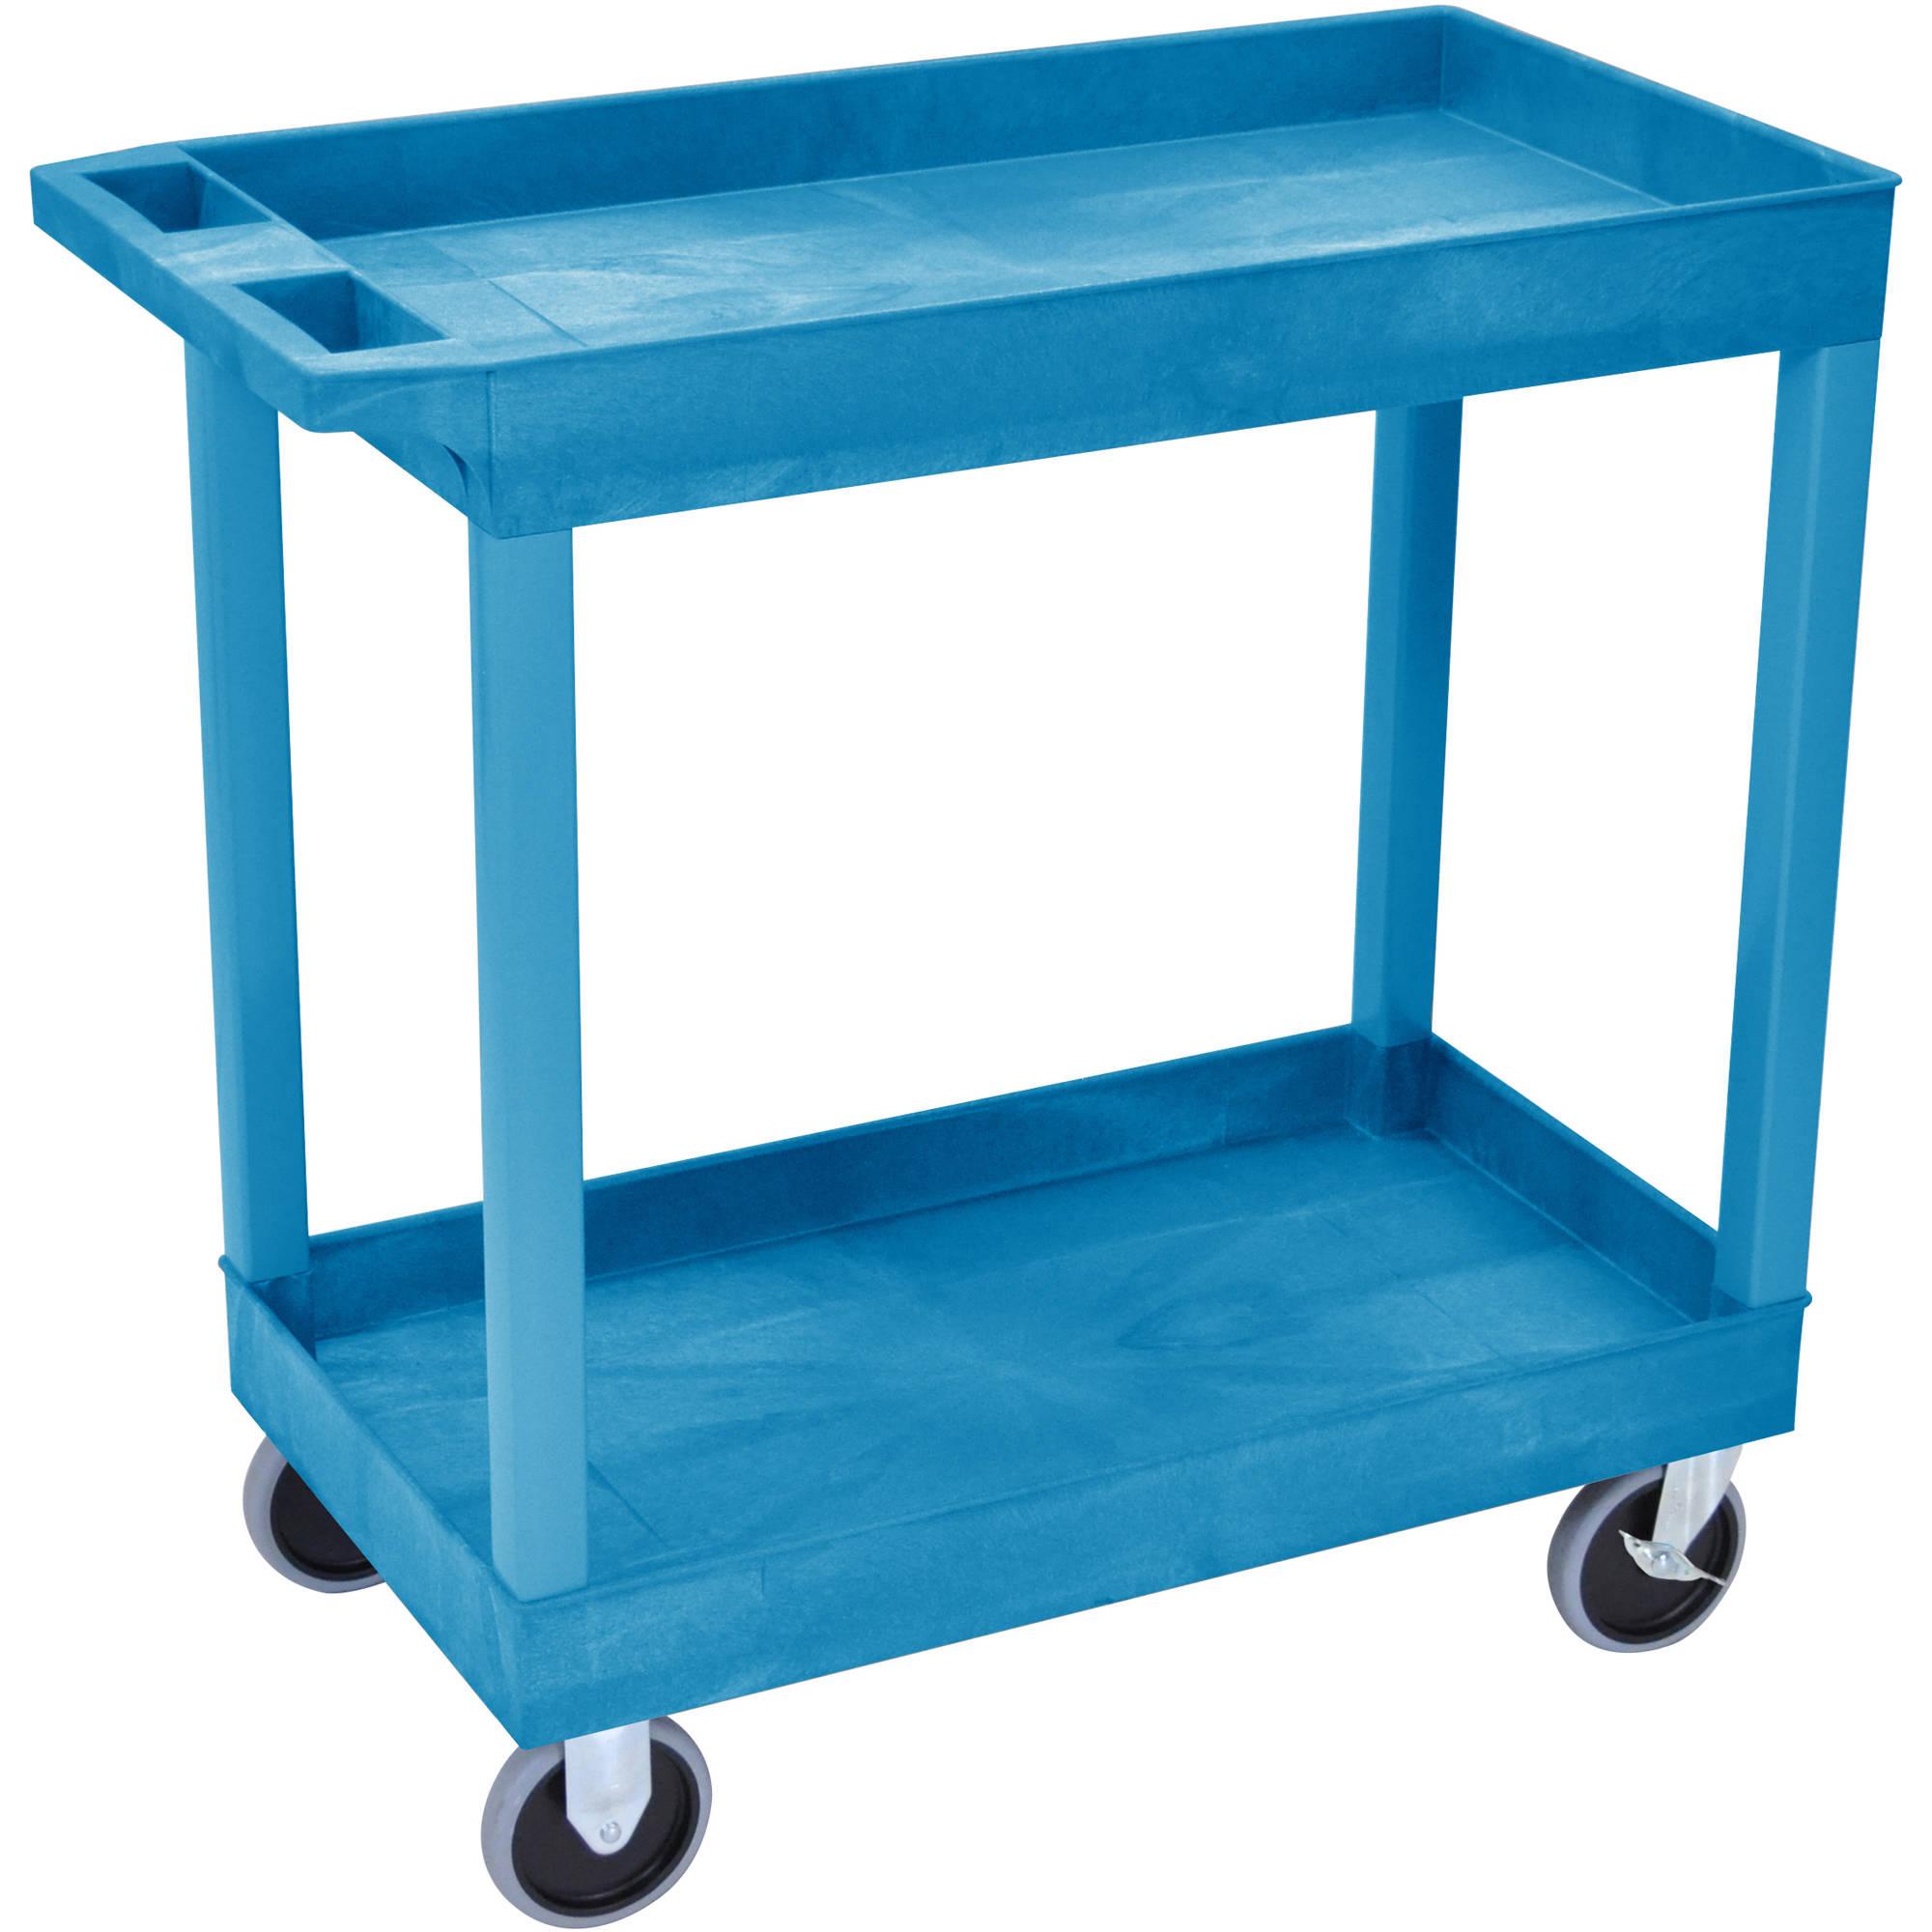 Luxor 32 x 18 Tub Cart with Two Shelves EC11HDBU BH